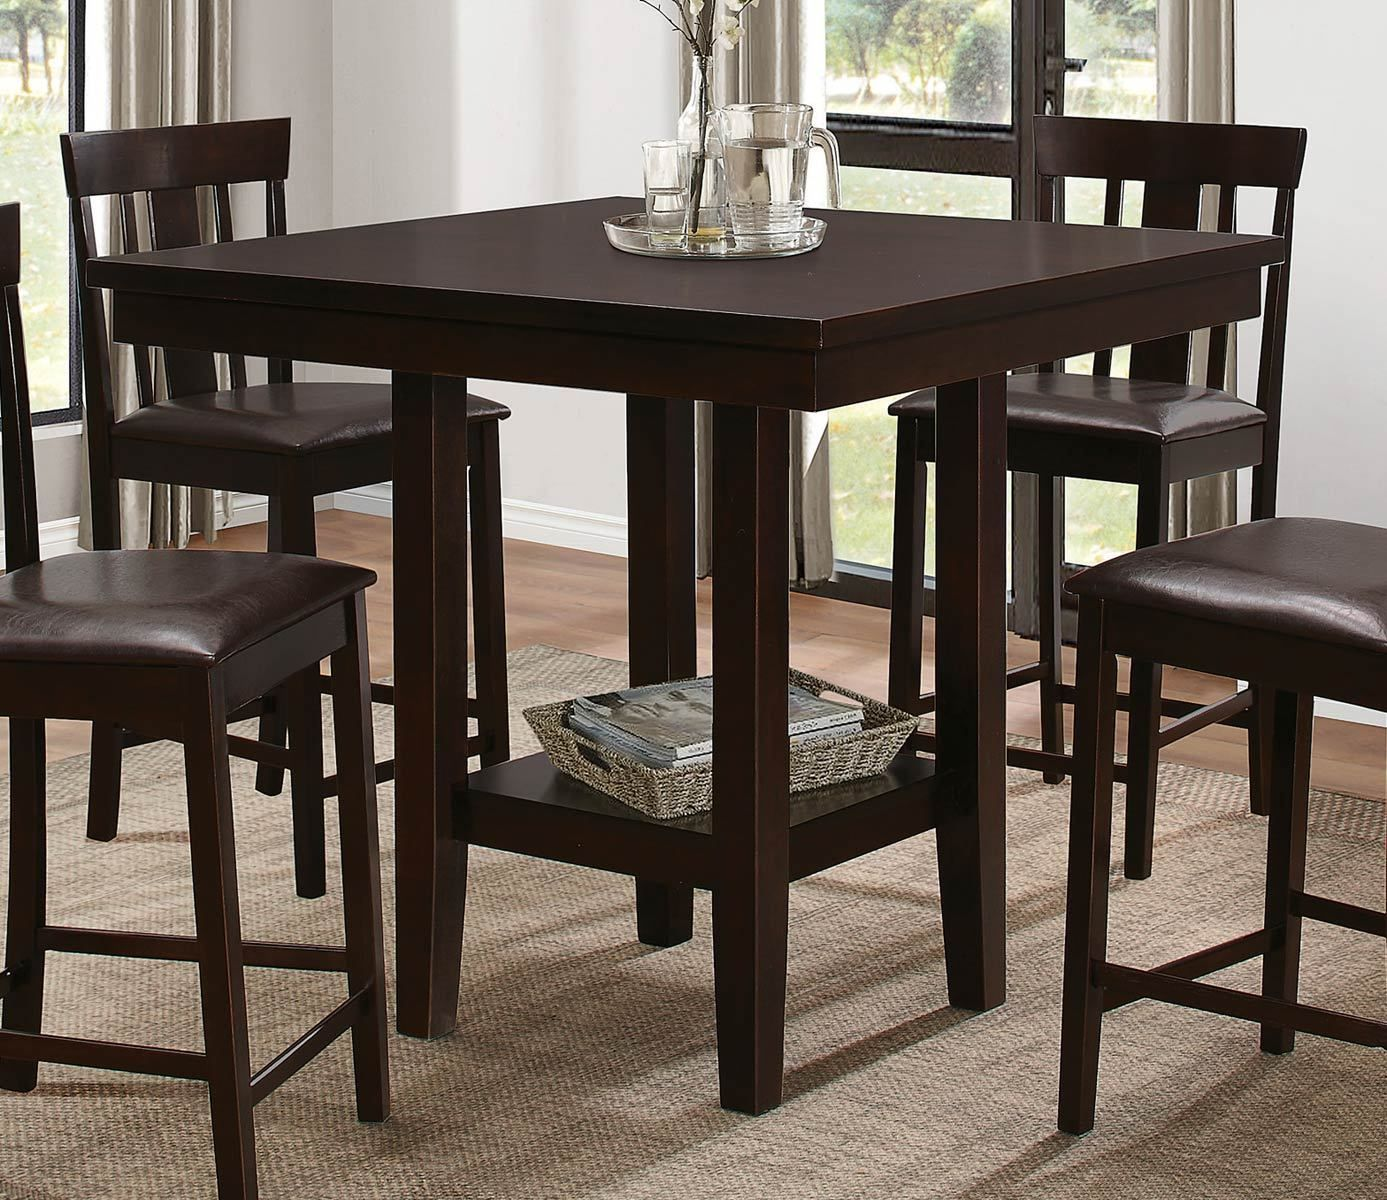 5460 36 Diego Casual Versatile Espresso Counter Height Dining